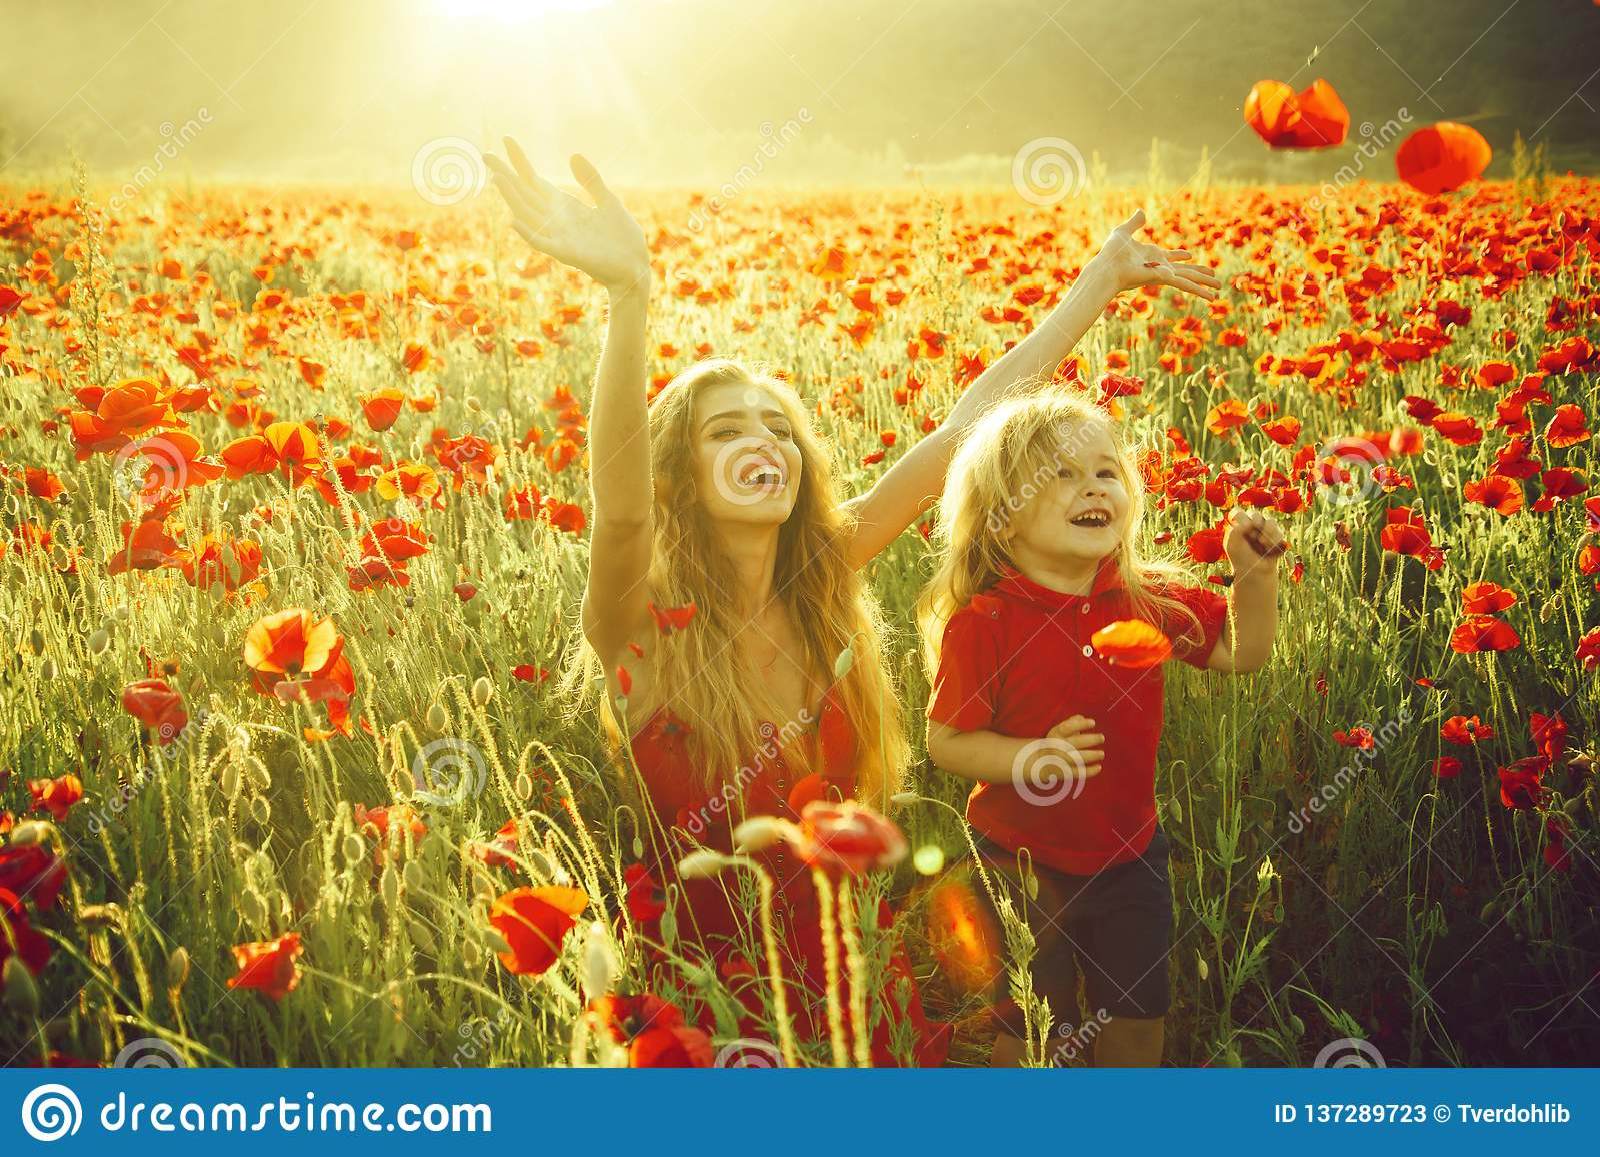 Liefde en familie, gelukkig moeder en kind op papavergebied